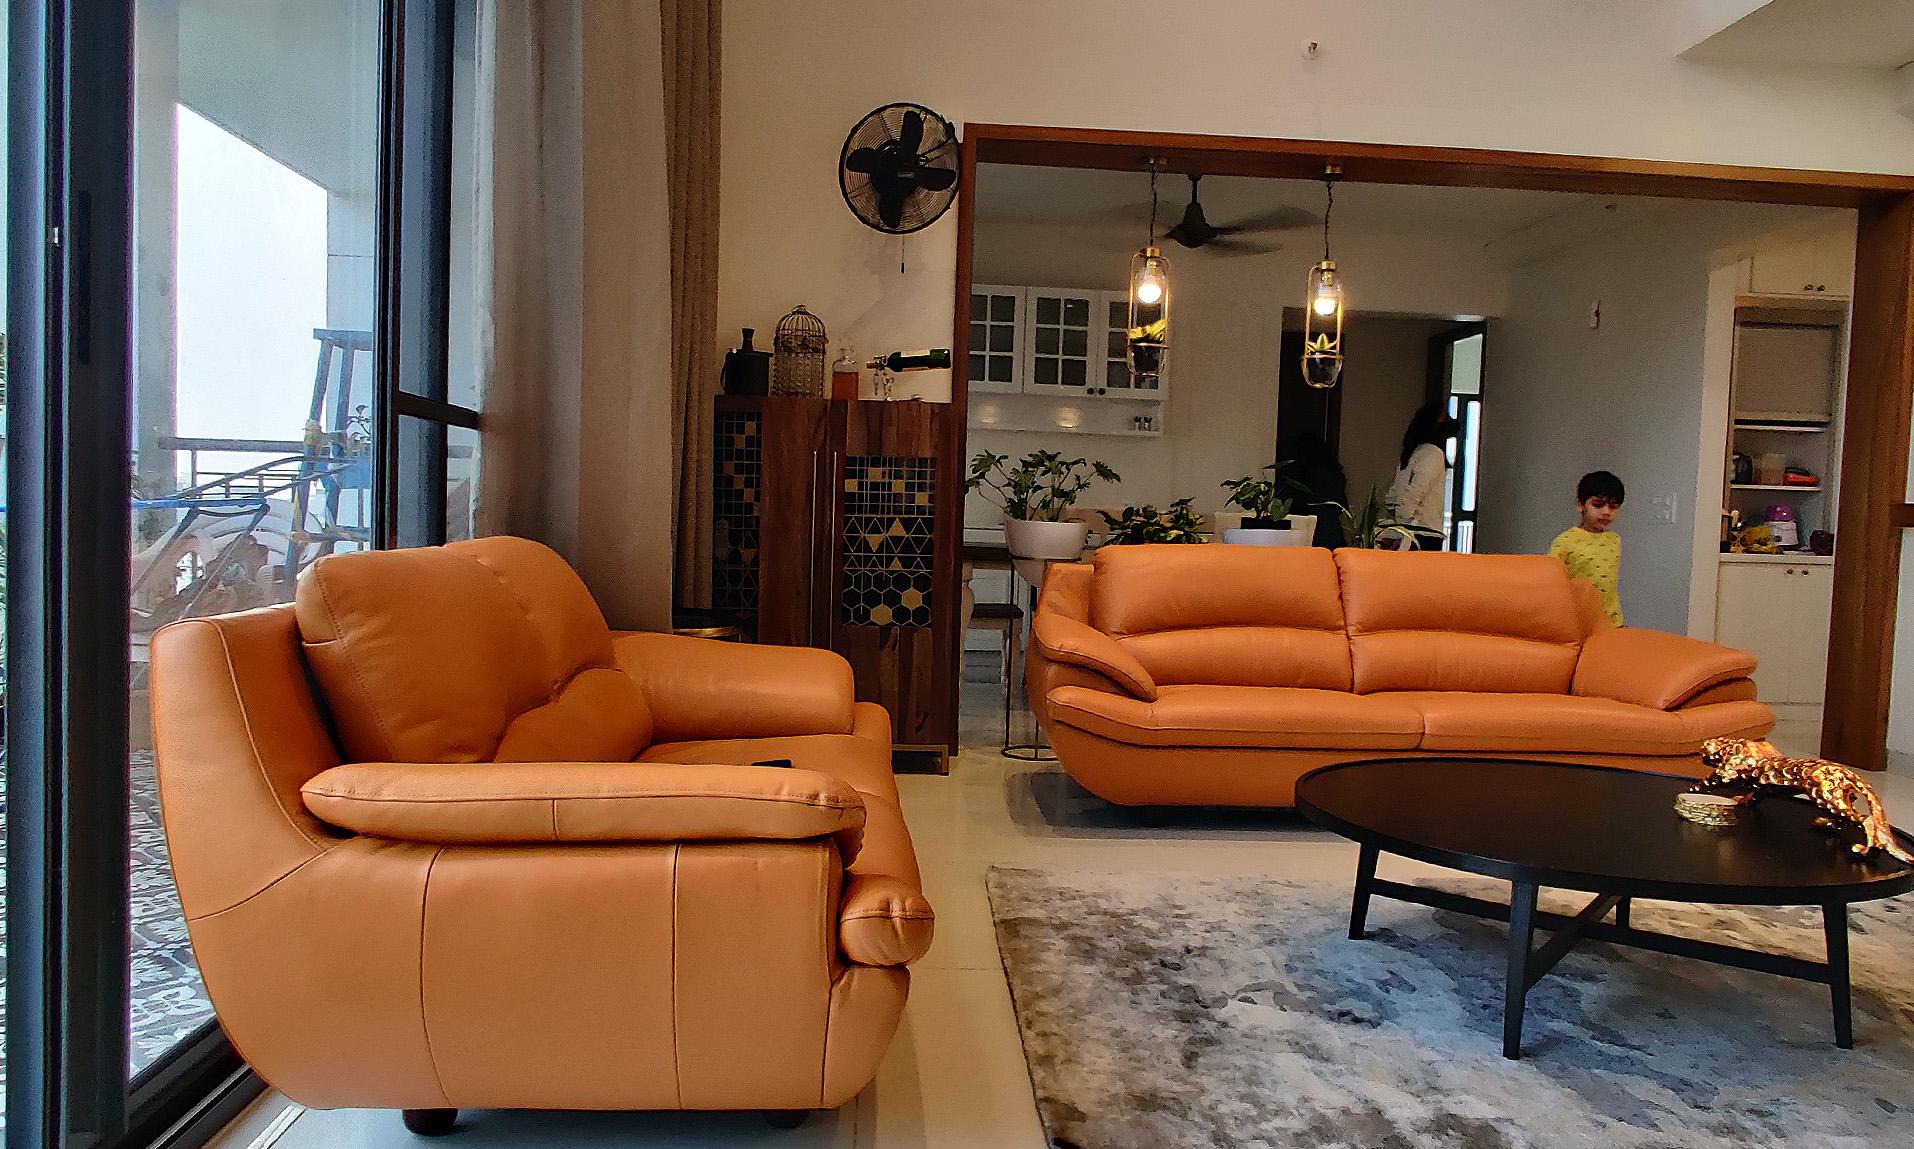 sofa around carpet and center coffee table